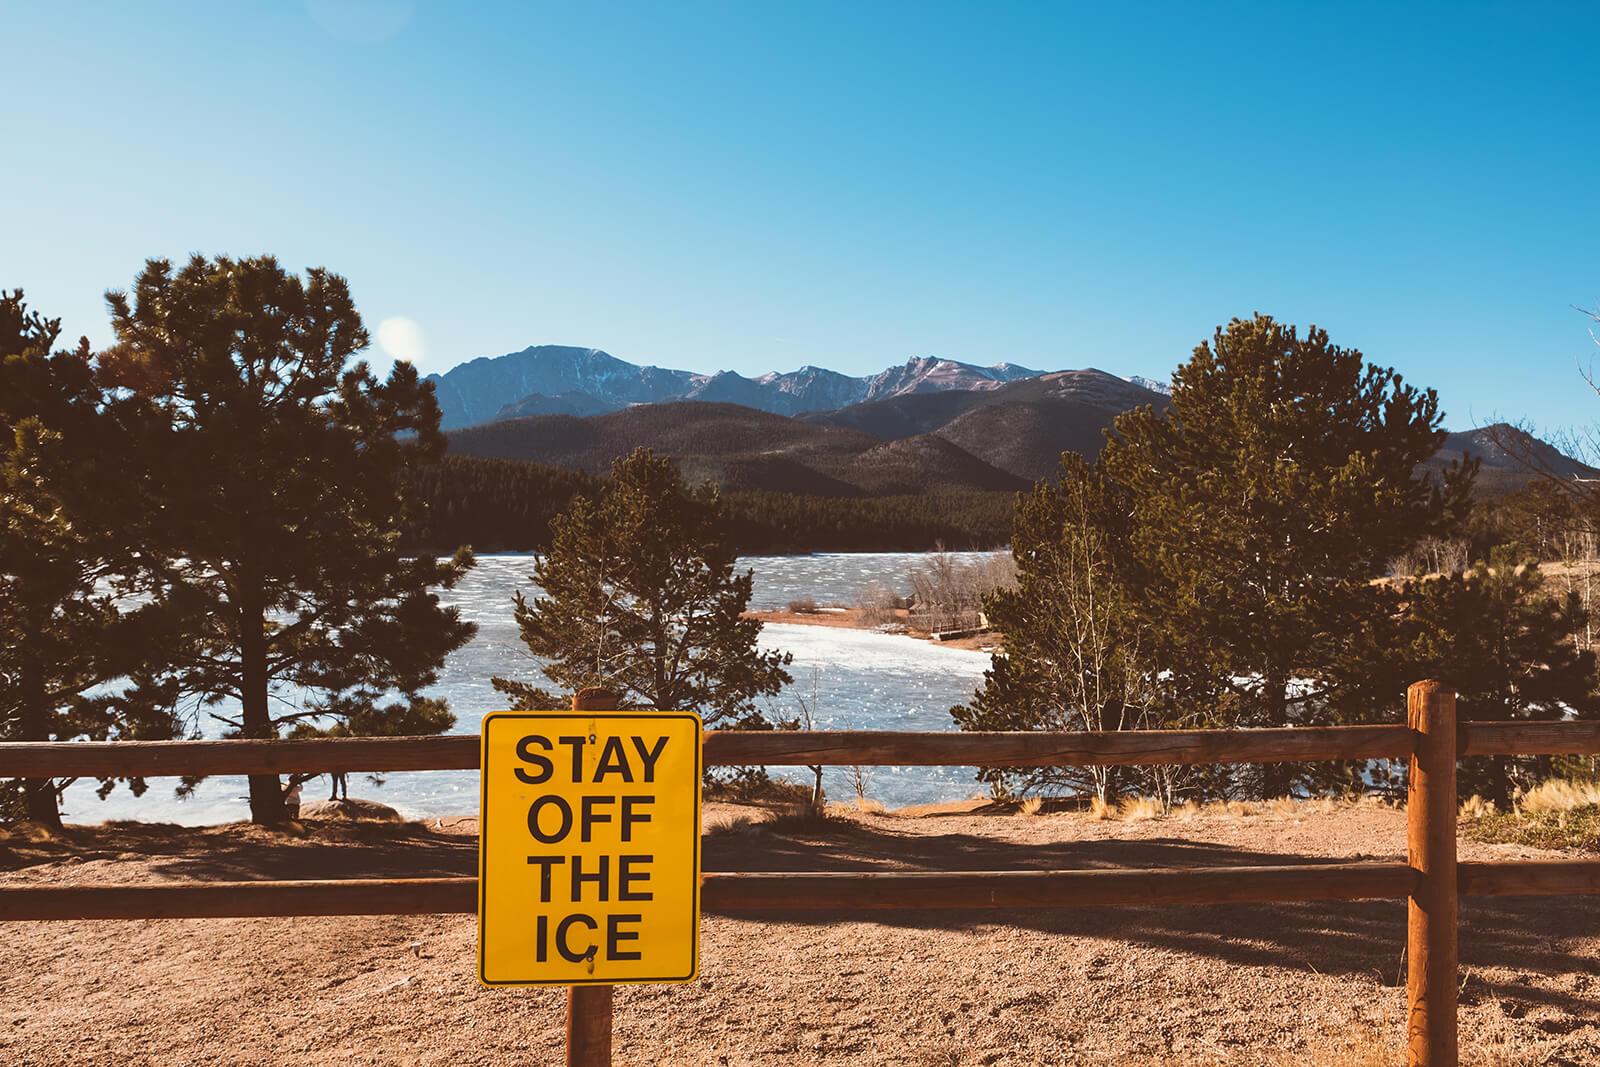 Pike's Peak Reservoir, AKA Pike's Peak Lake, is located near mile marker 16 on the drive up Pike's Peak in Colorado